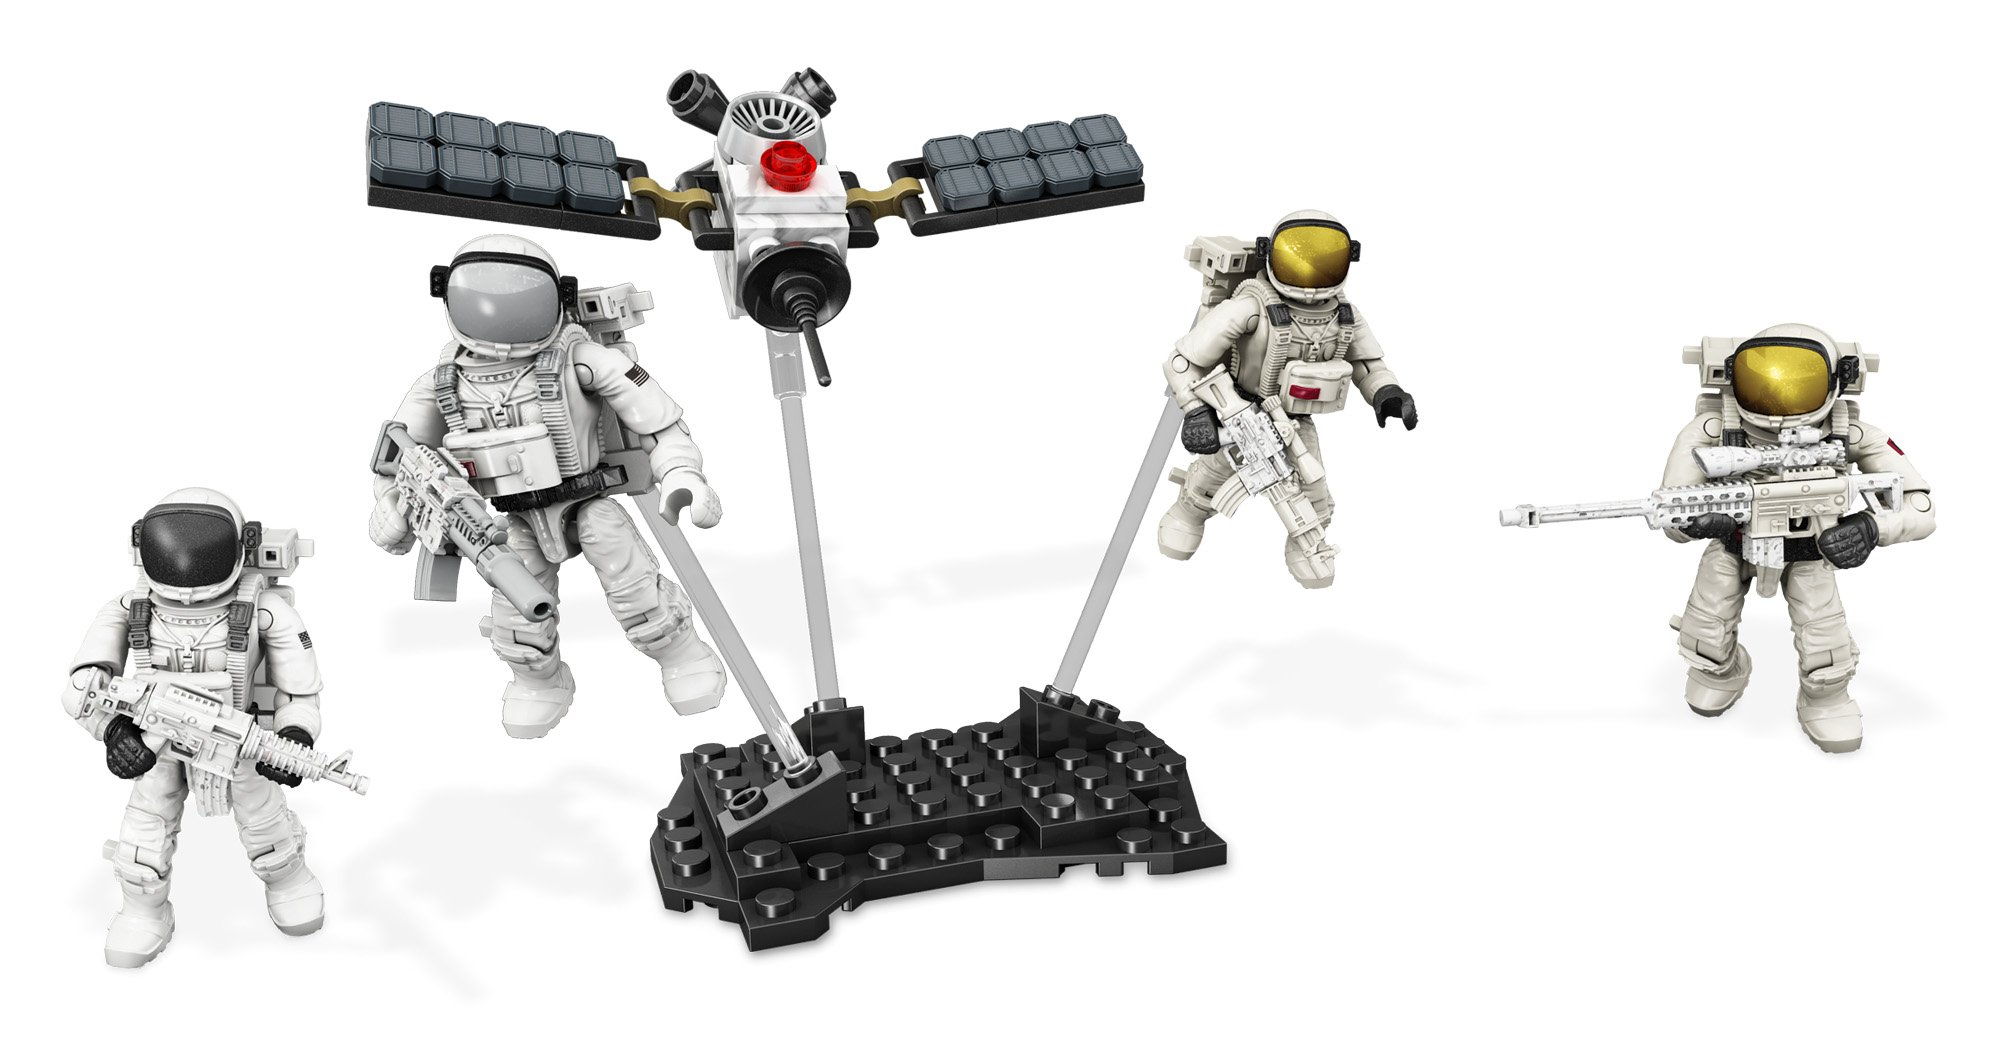 Mega Bloks Call of Duty Icarus Troopers Playset